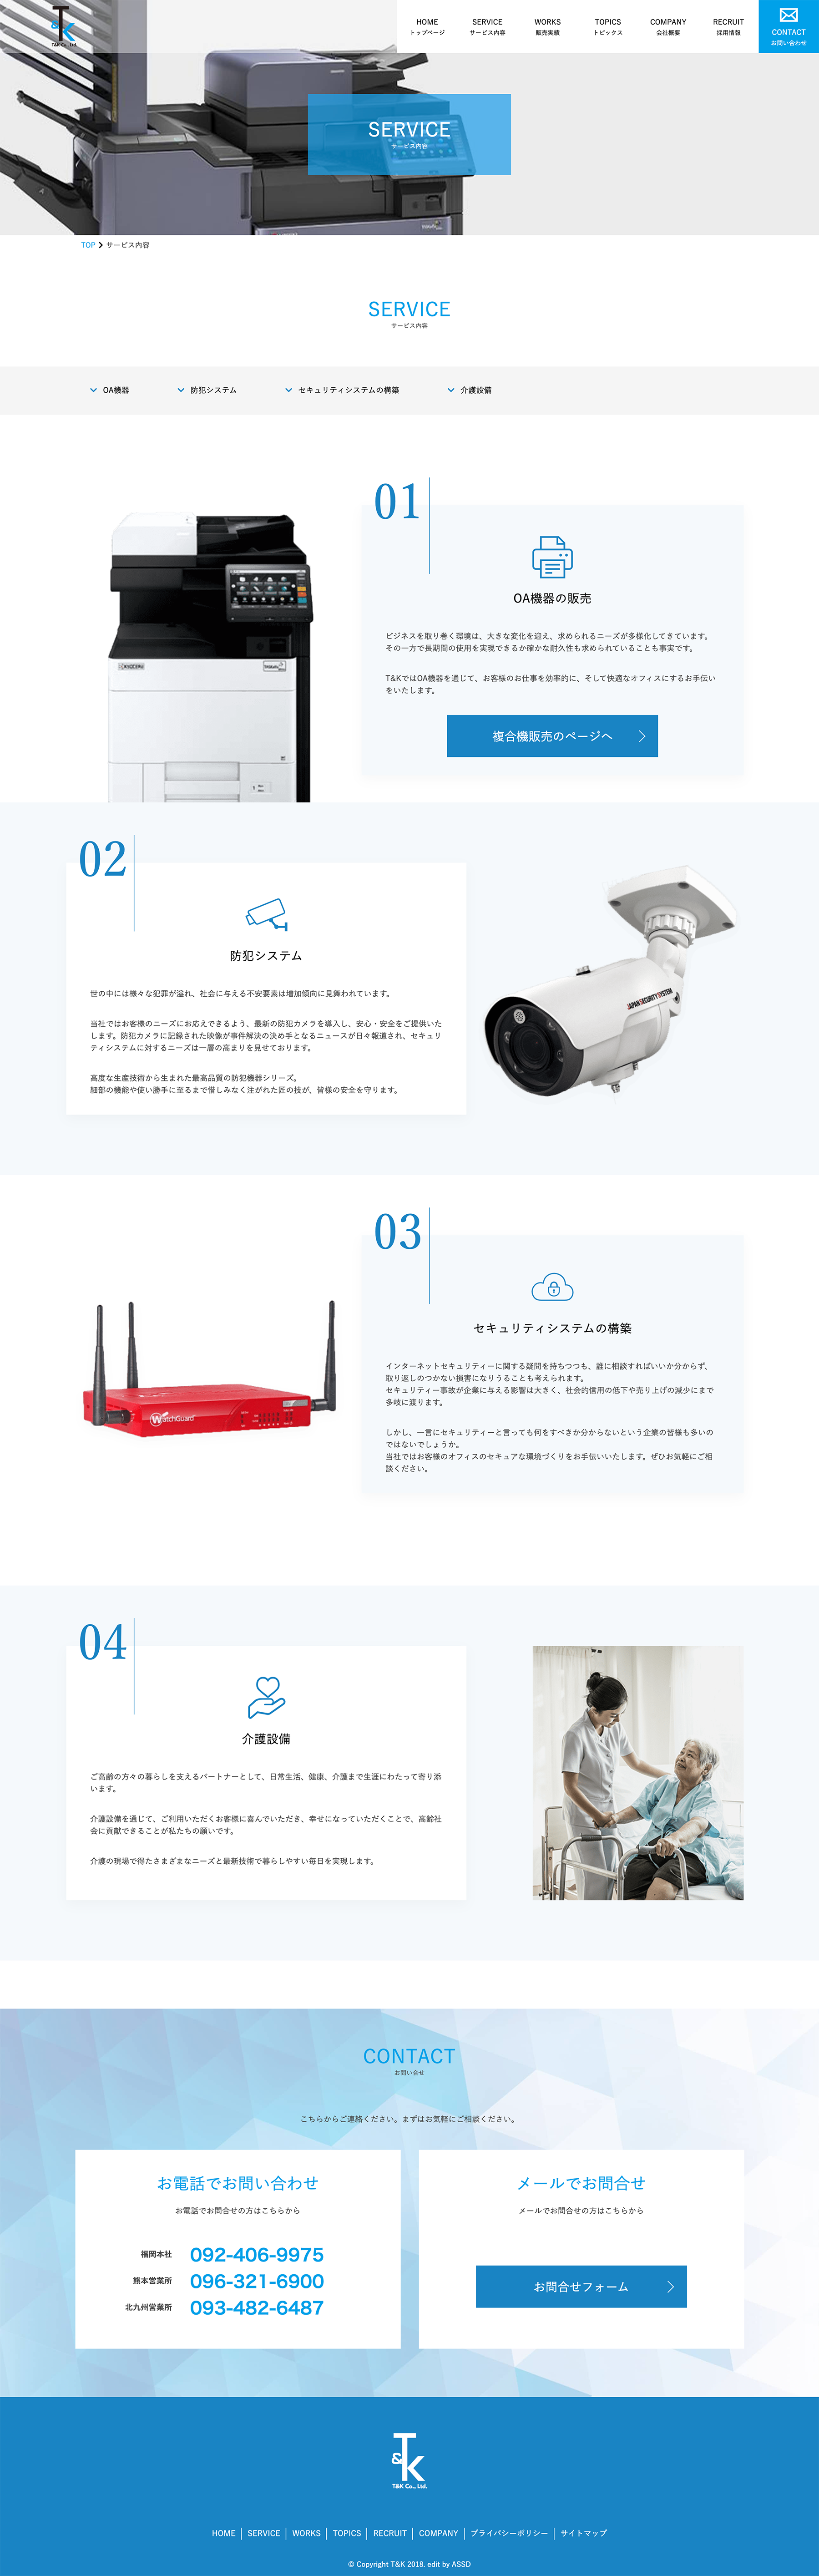 T&K株式会社様 ホームページ PC画像